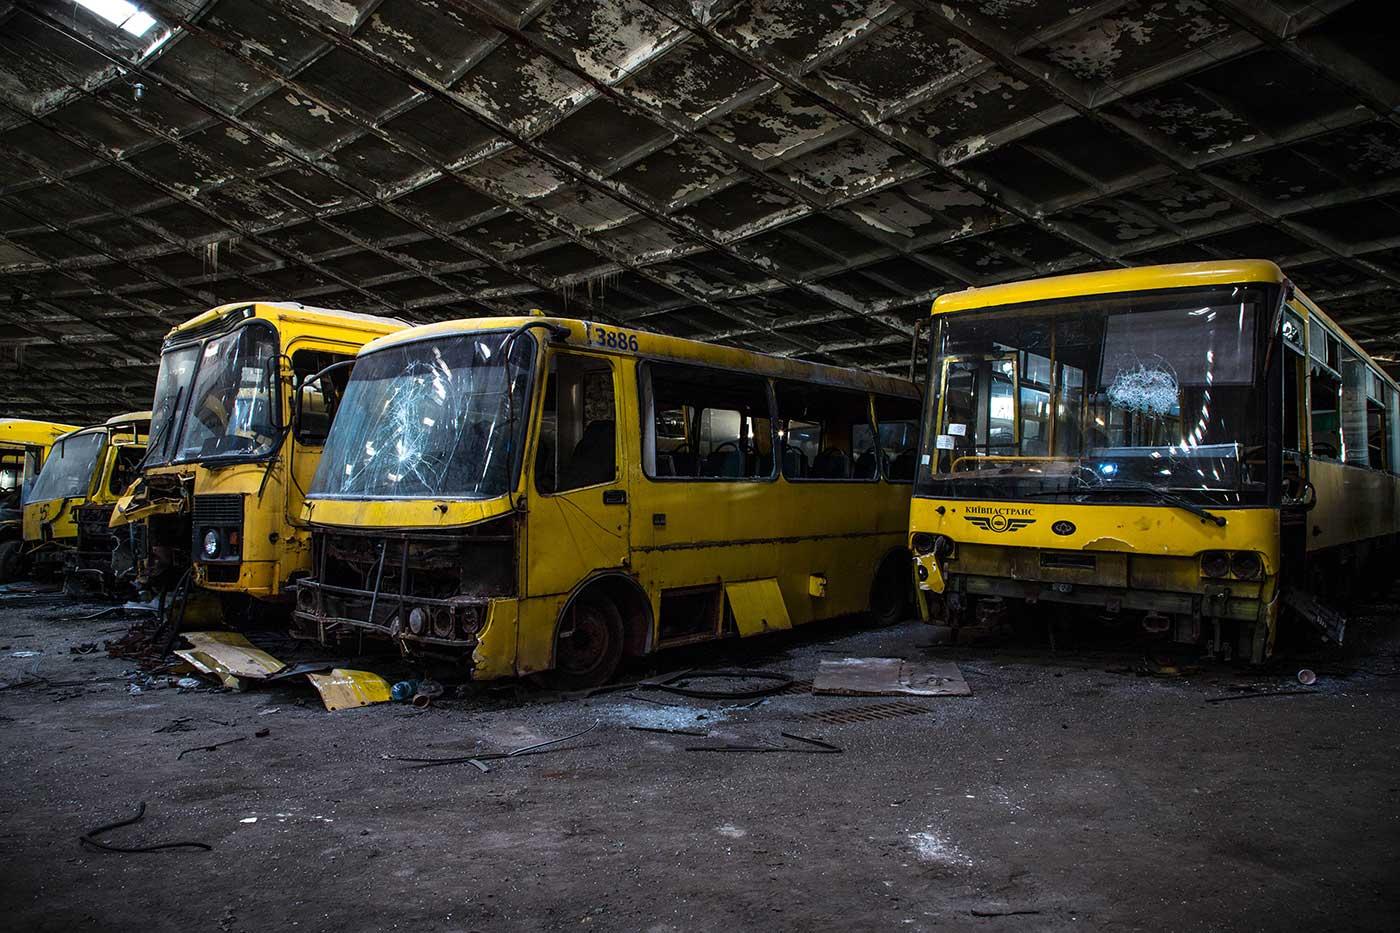 Autobus Park №7: the abandoned bus depot in Kyiv, Ukraine.